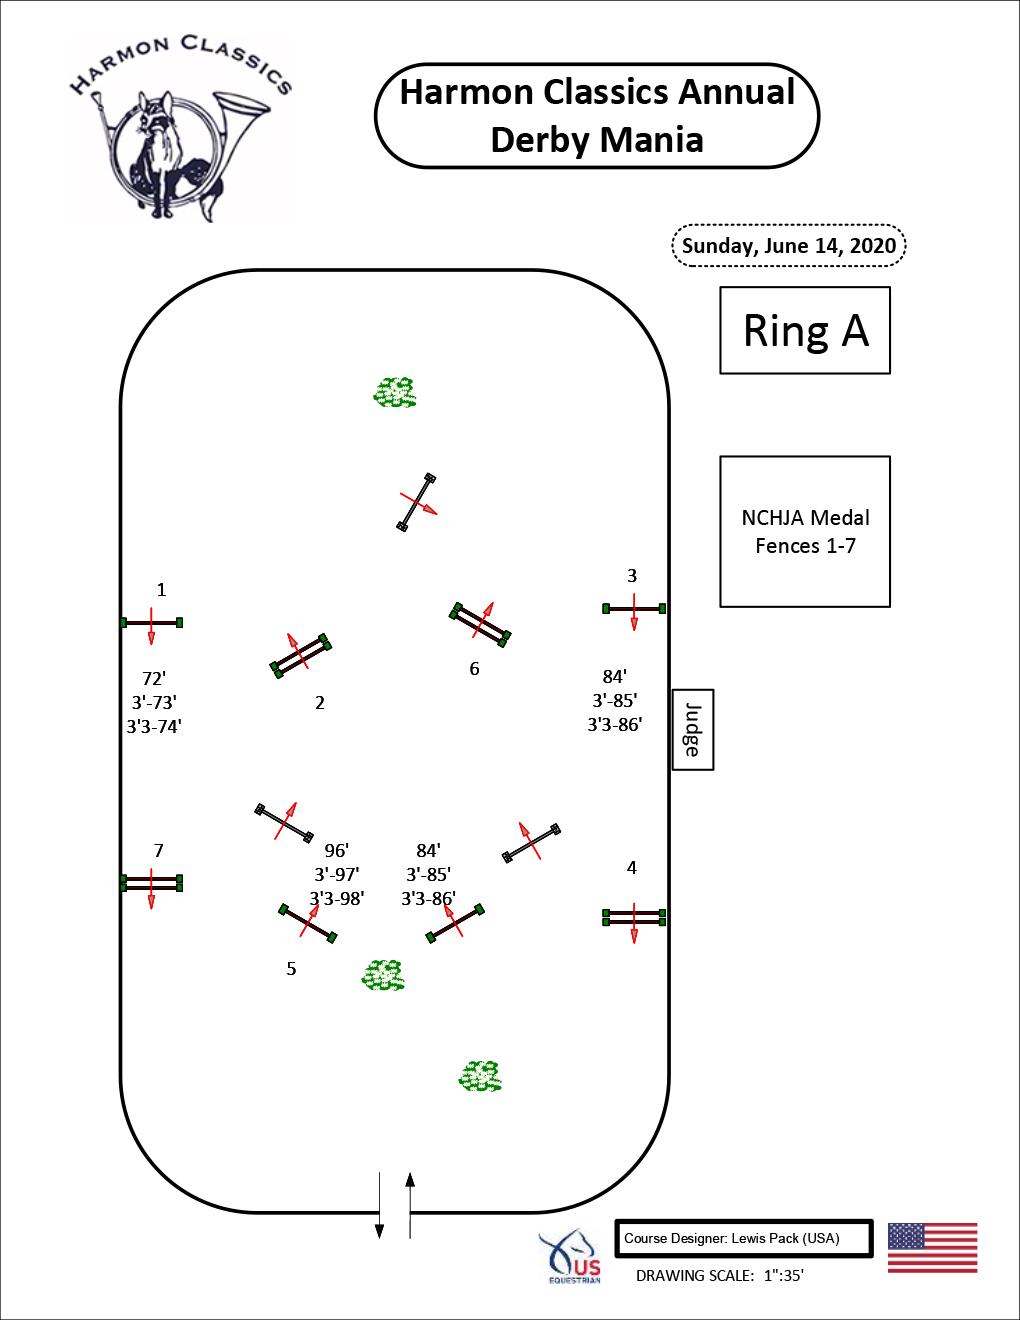 Ring-A-Sunday6-14-NCHJA-Medal-Harmon-Classics-Derby-Mania